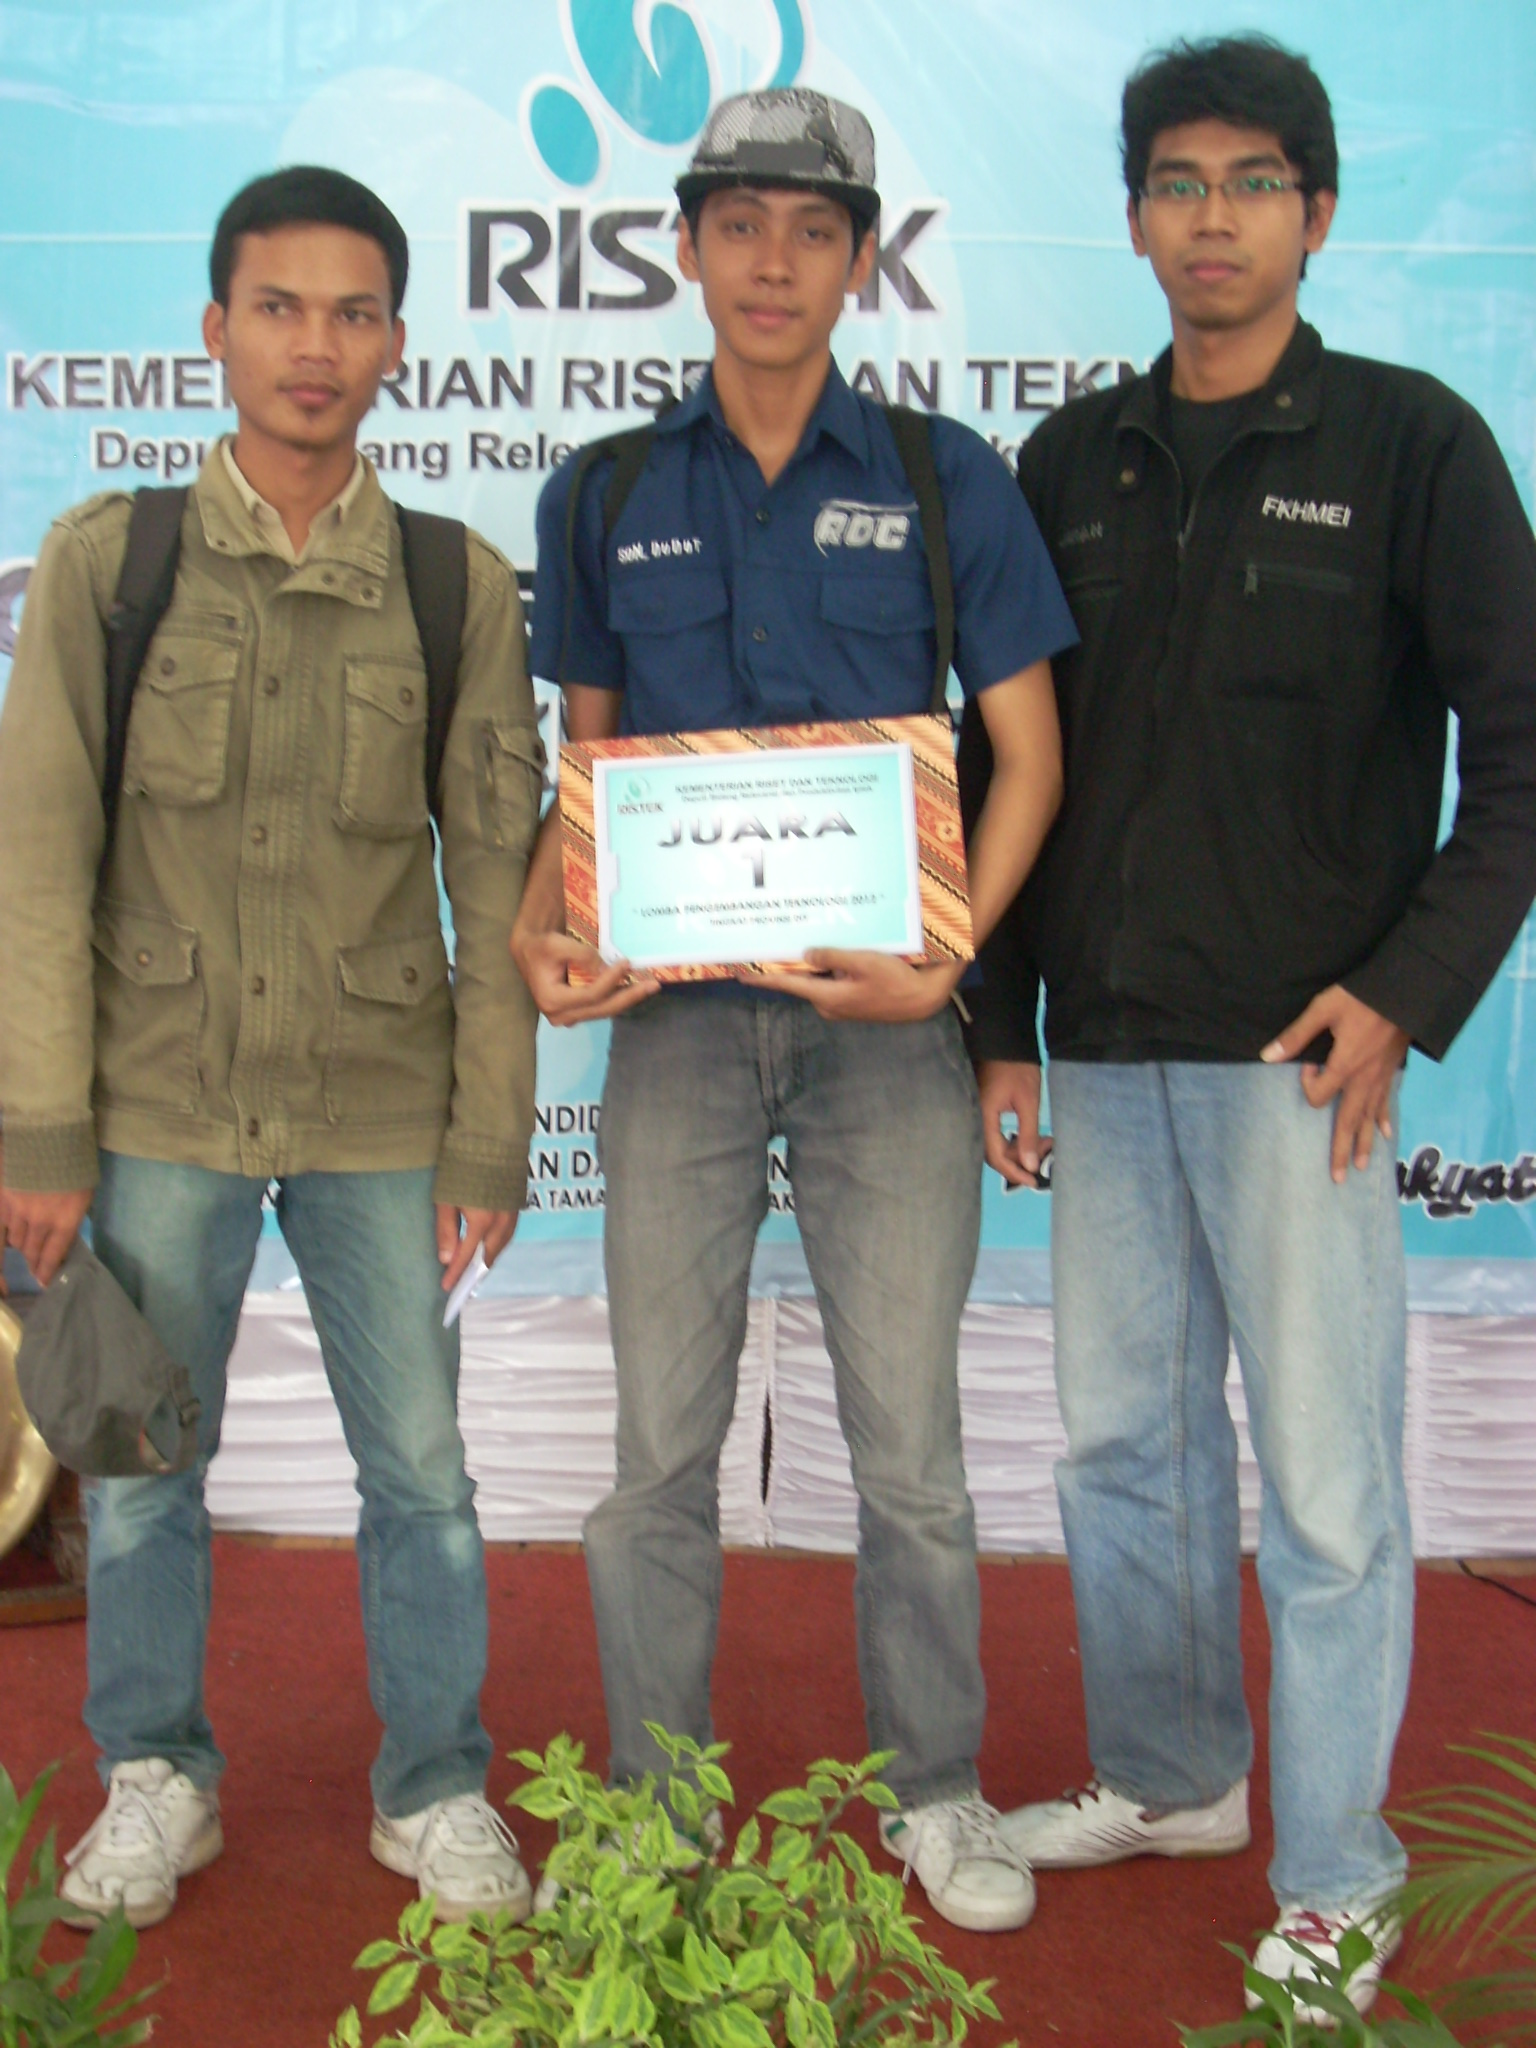 Juara 1 lomba Ristek